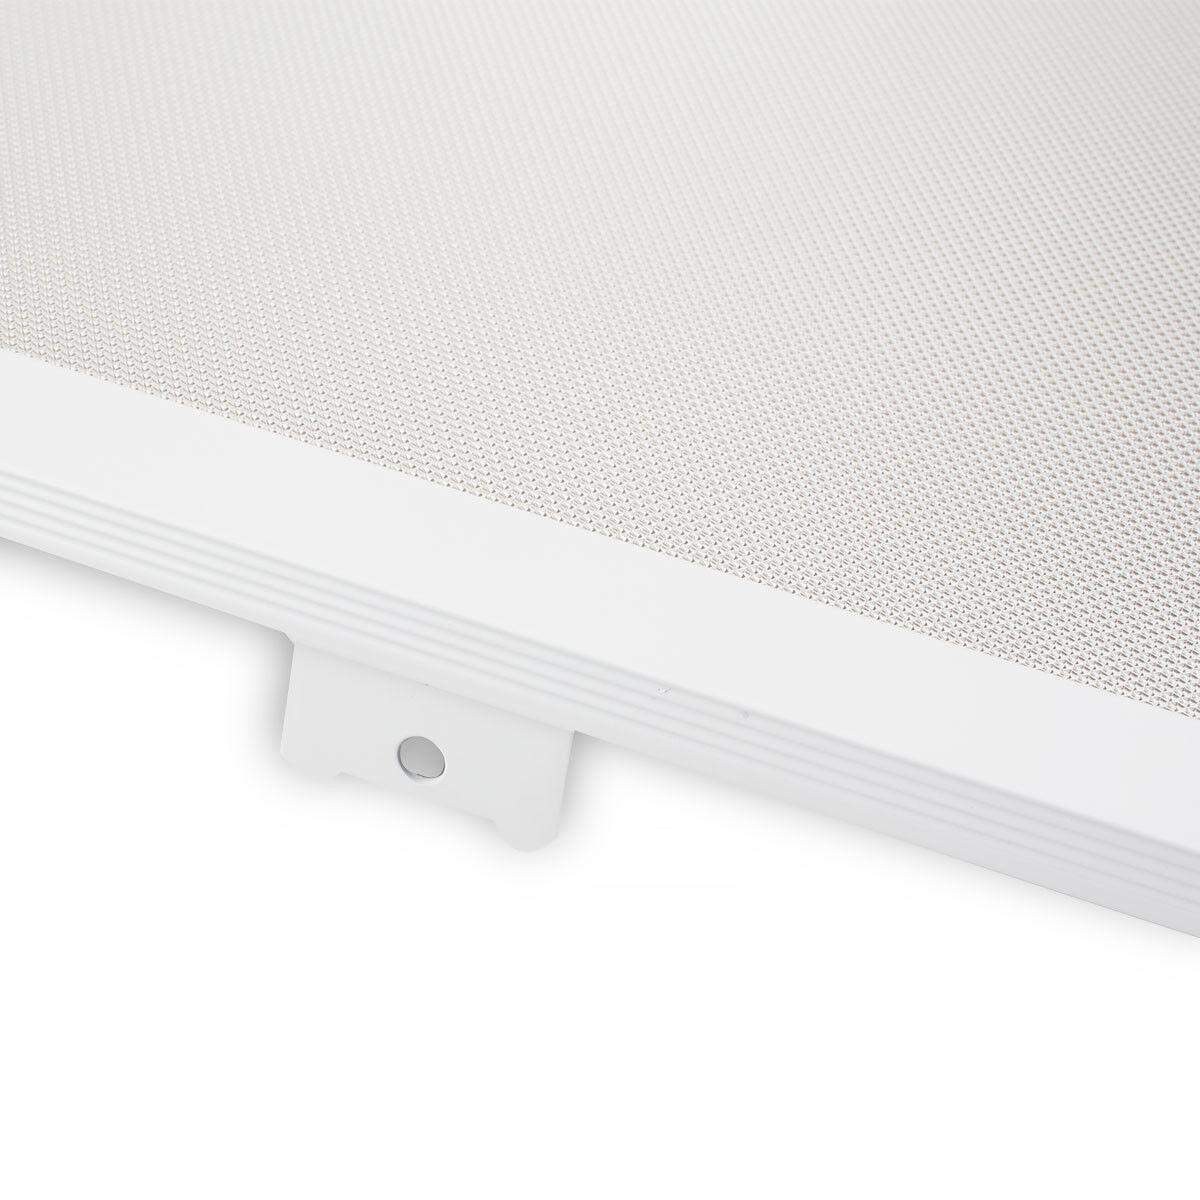 LED Einlegepanel 1195x295 38W 38W 38W (W) 840 Neutralweiß UGR19  | Mangelware  f040d9